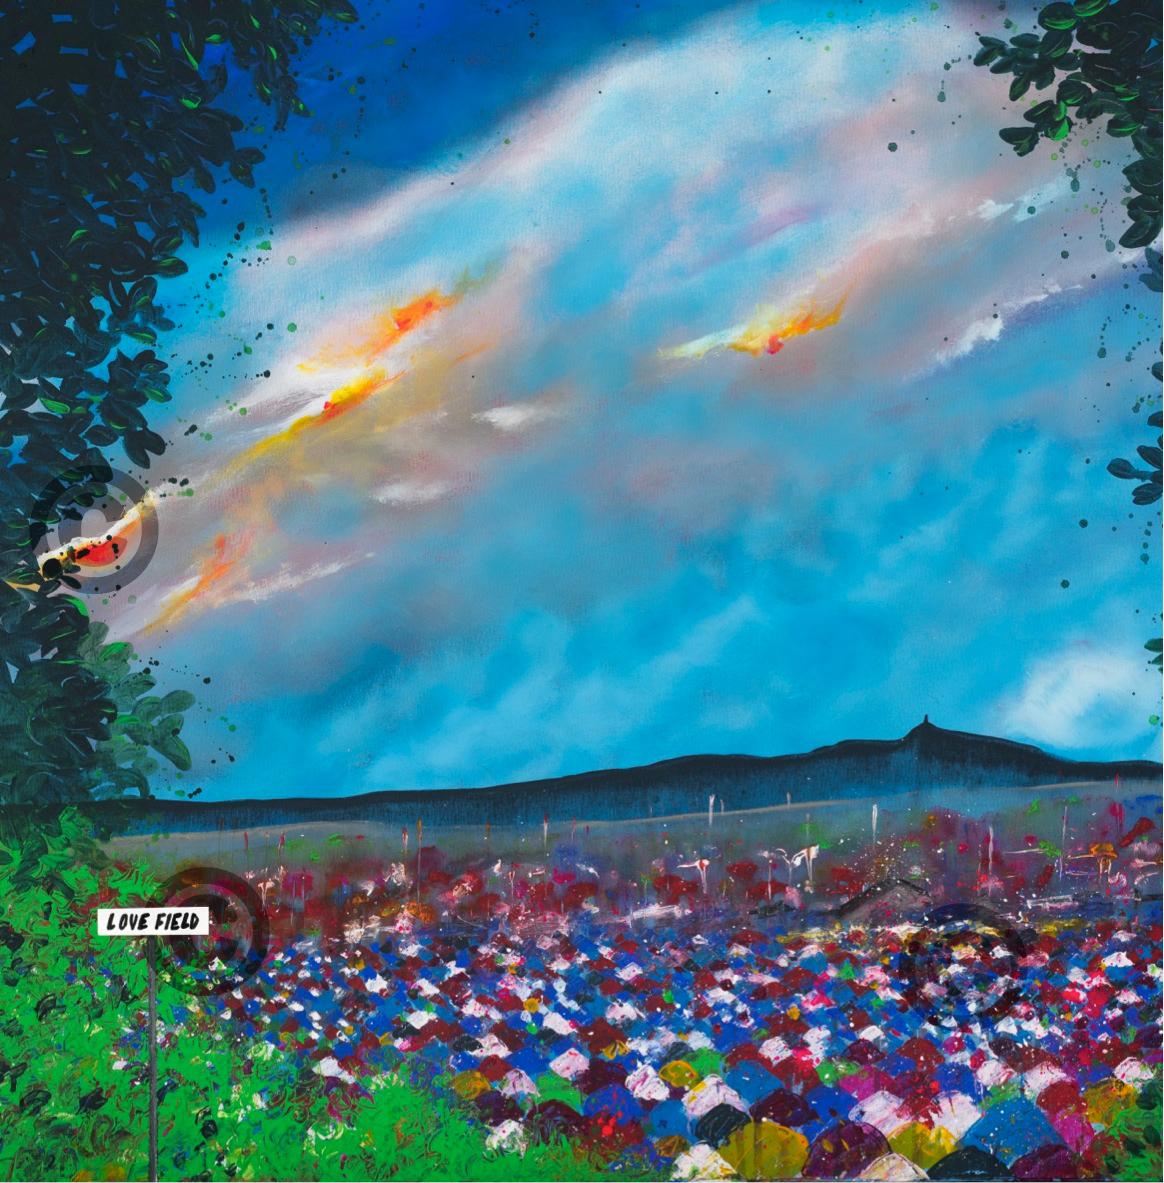 CP010 - Love Field